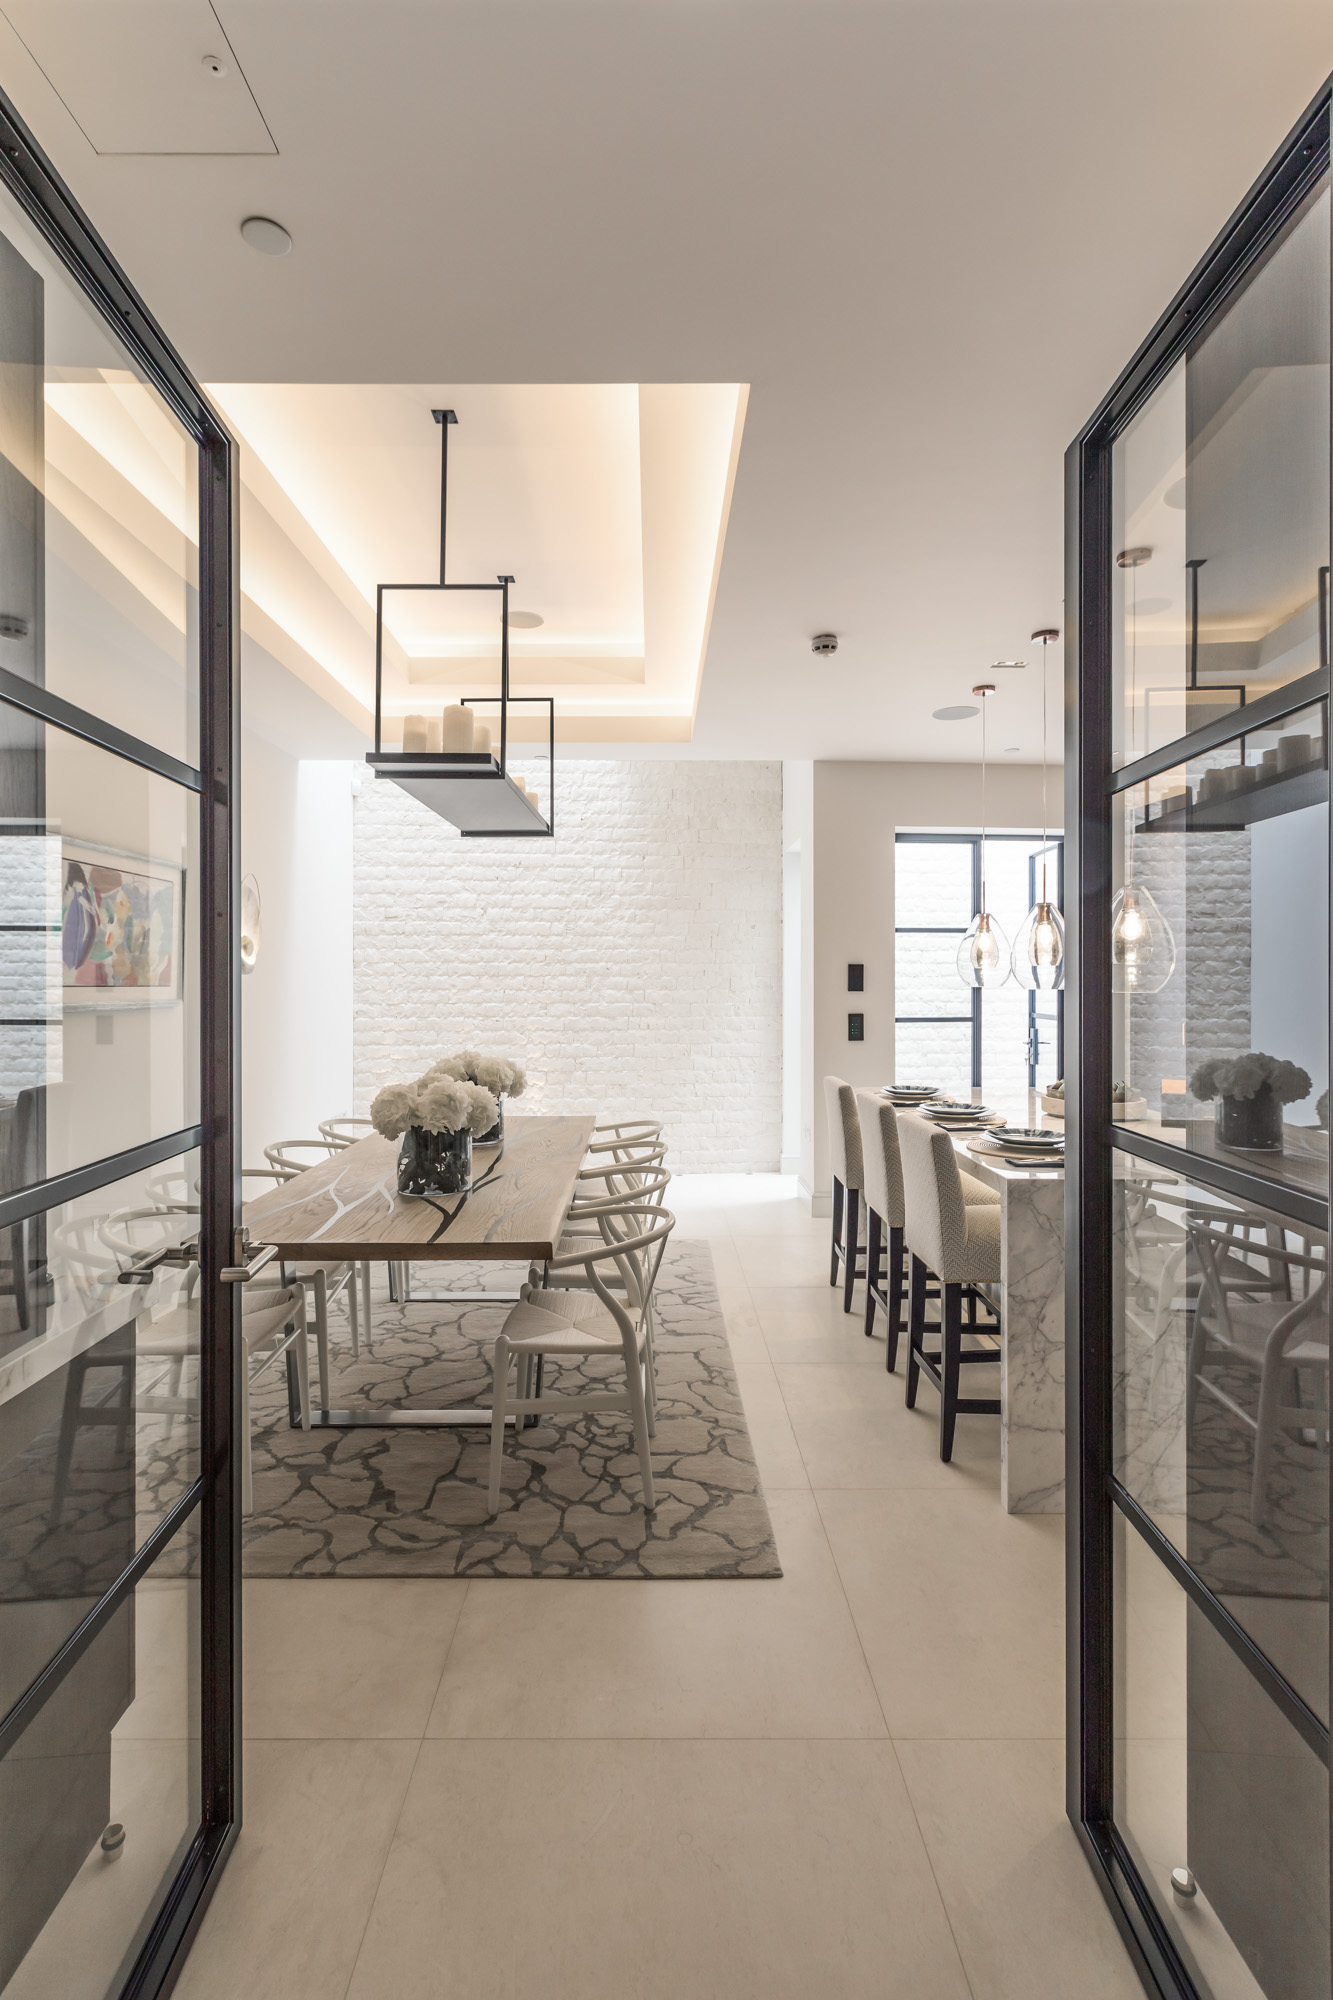 jonathan bond, interior photographer, view of kitchen table, chelsea, london